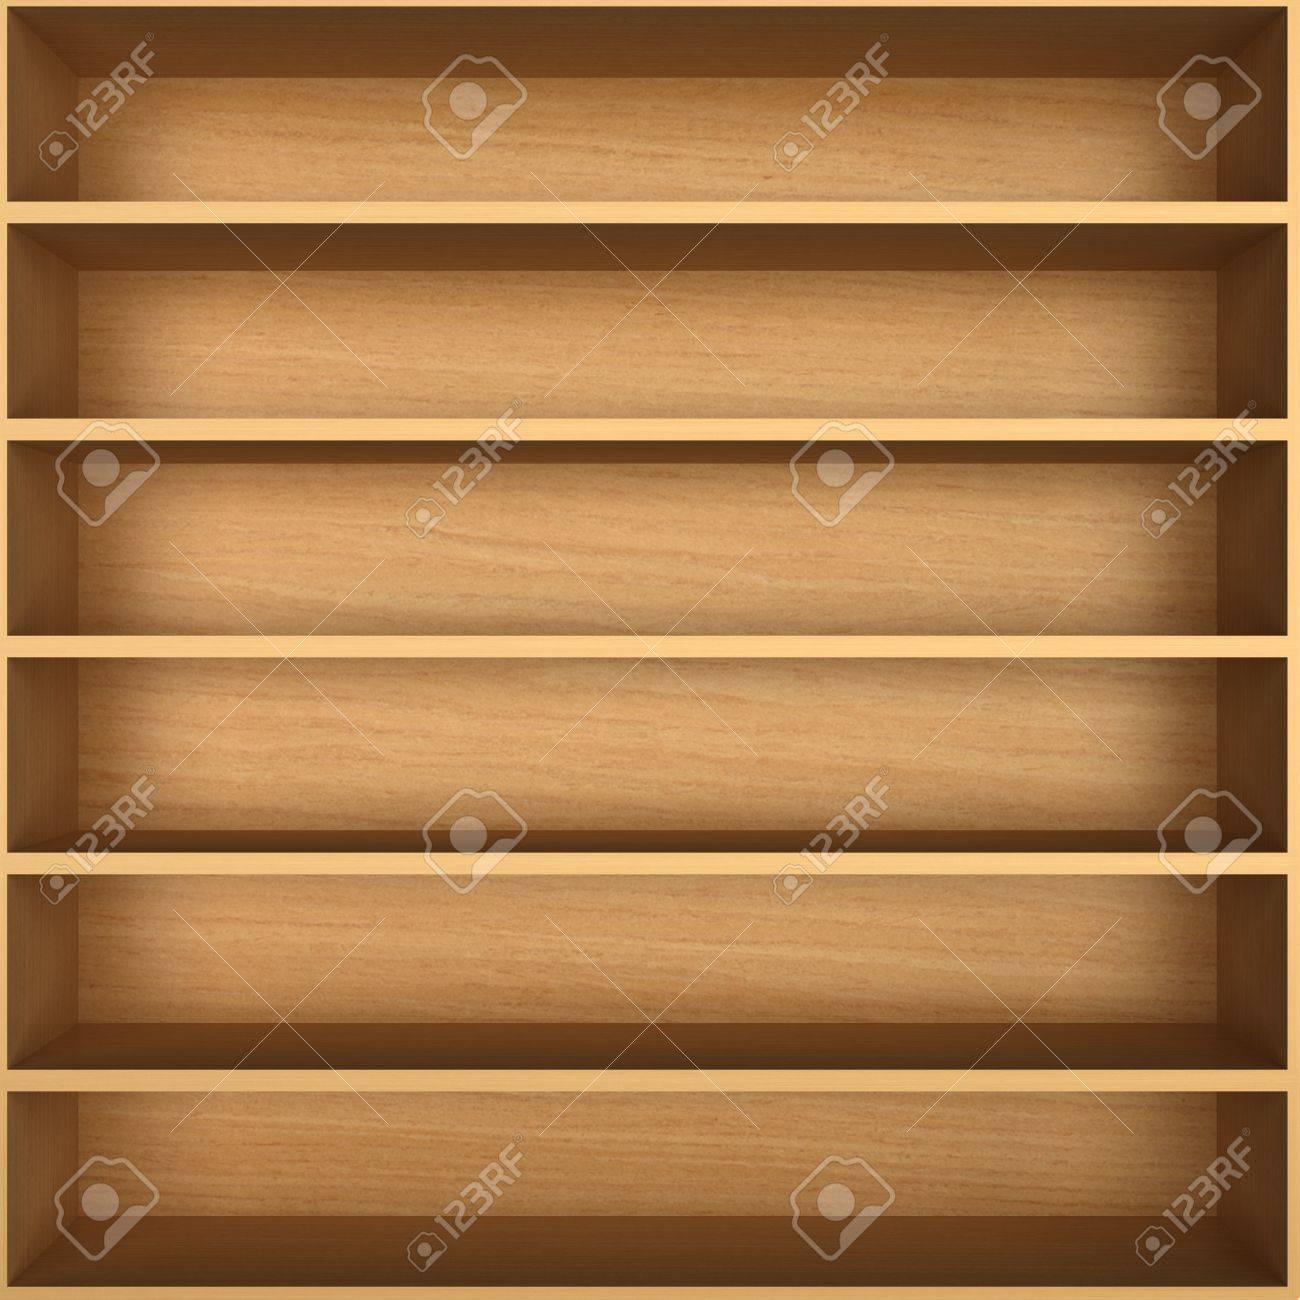 Blank wooden bookshelf Stock Photo - 20498381